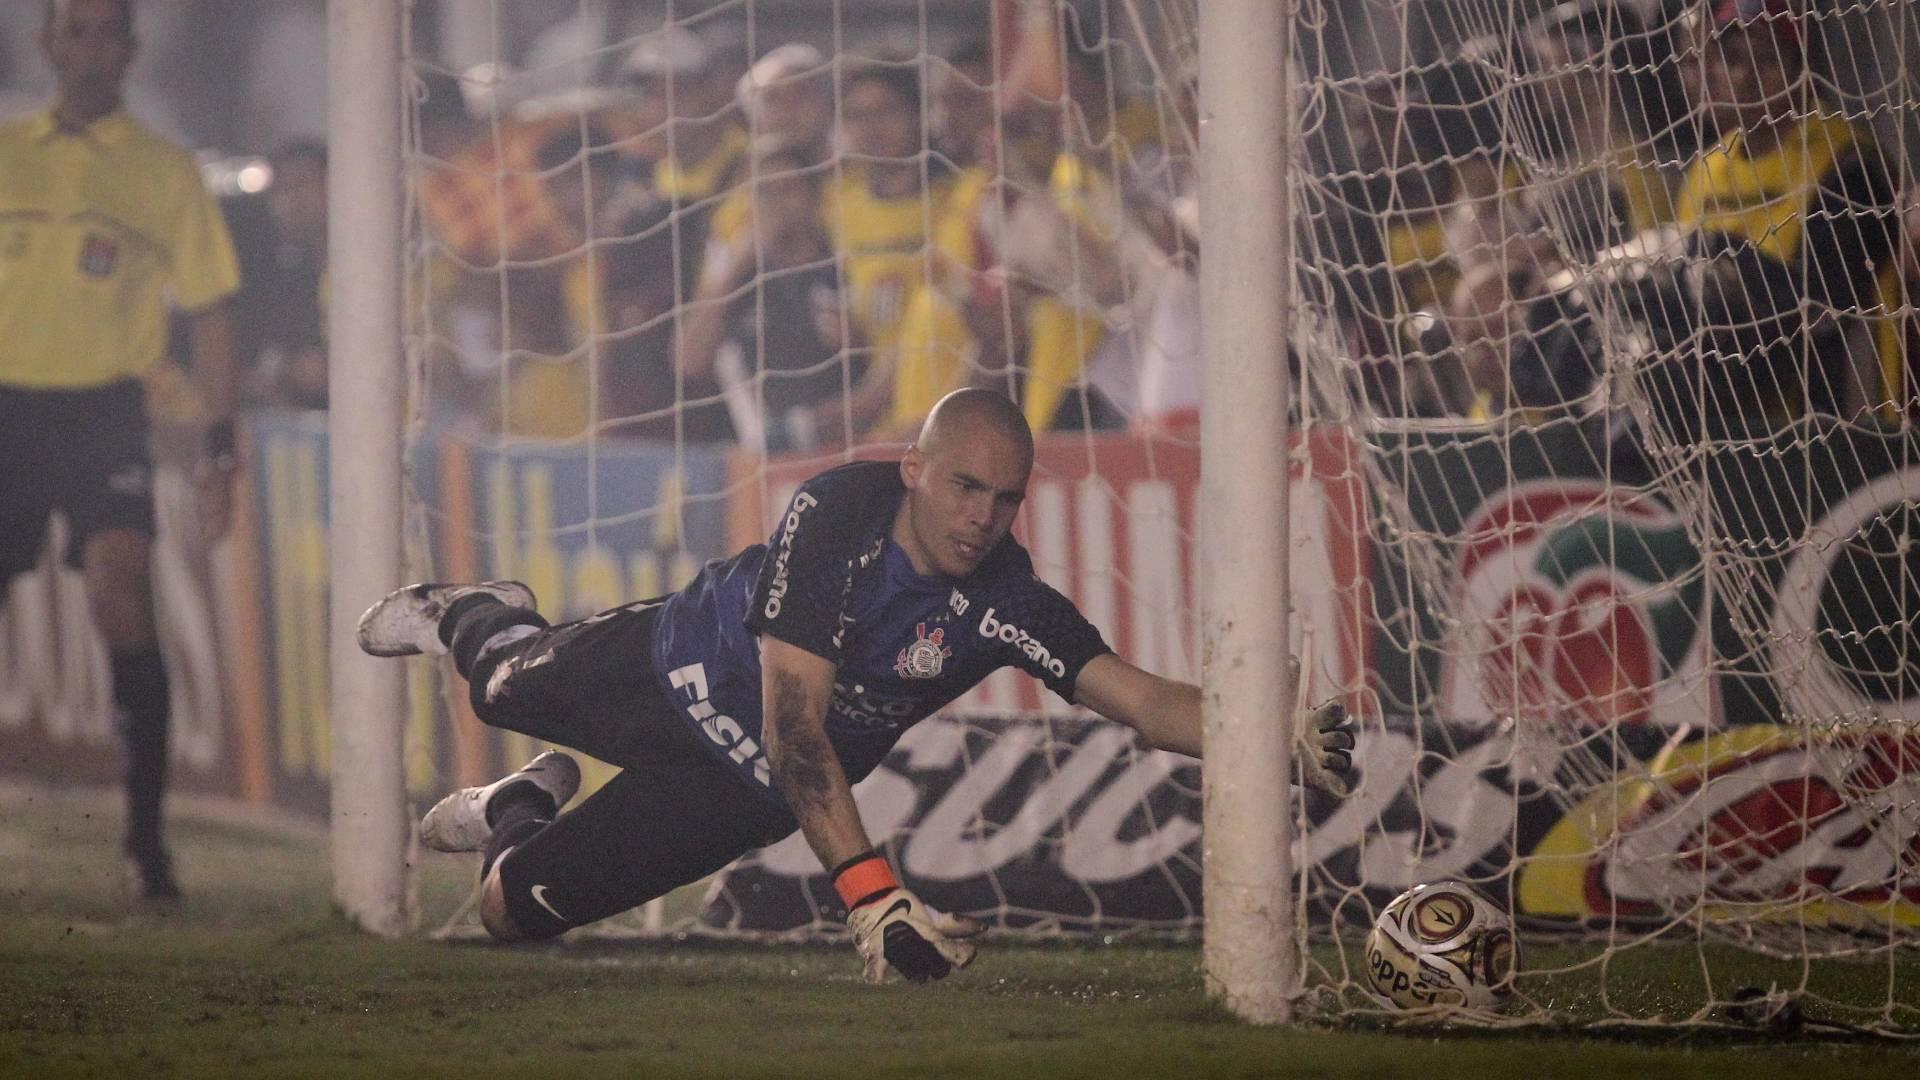 o goleiro Júlio César, do Corinthians, busca a bola no gol após falha na final do Campeonato Paulista 2011